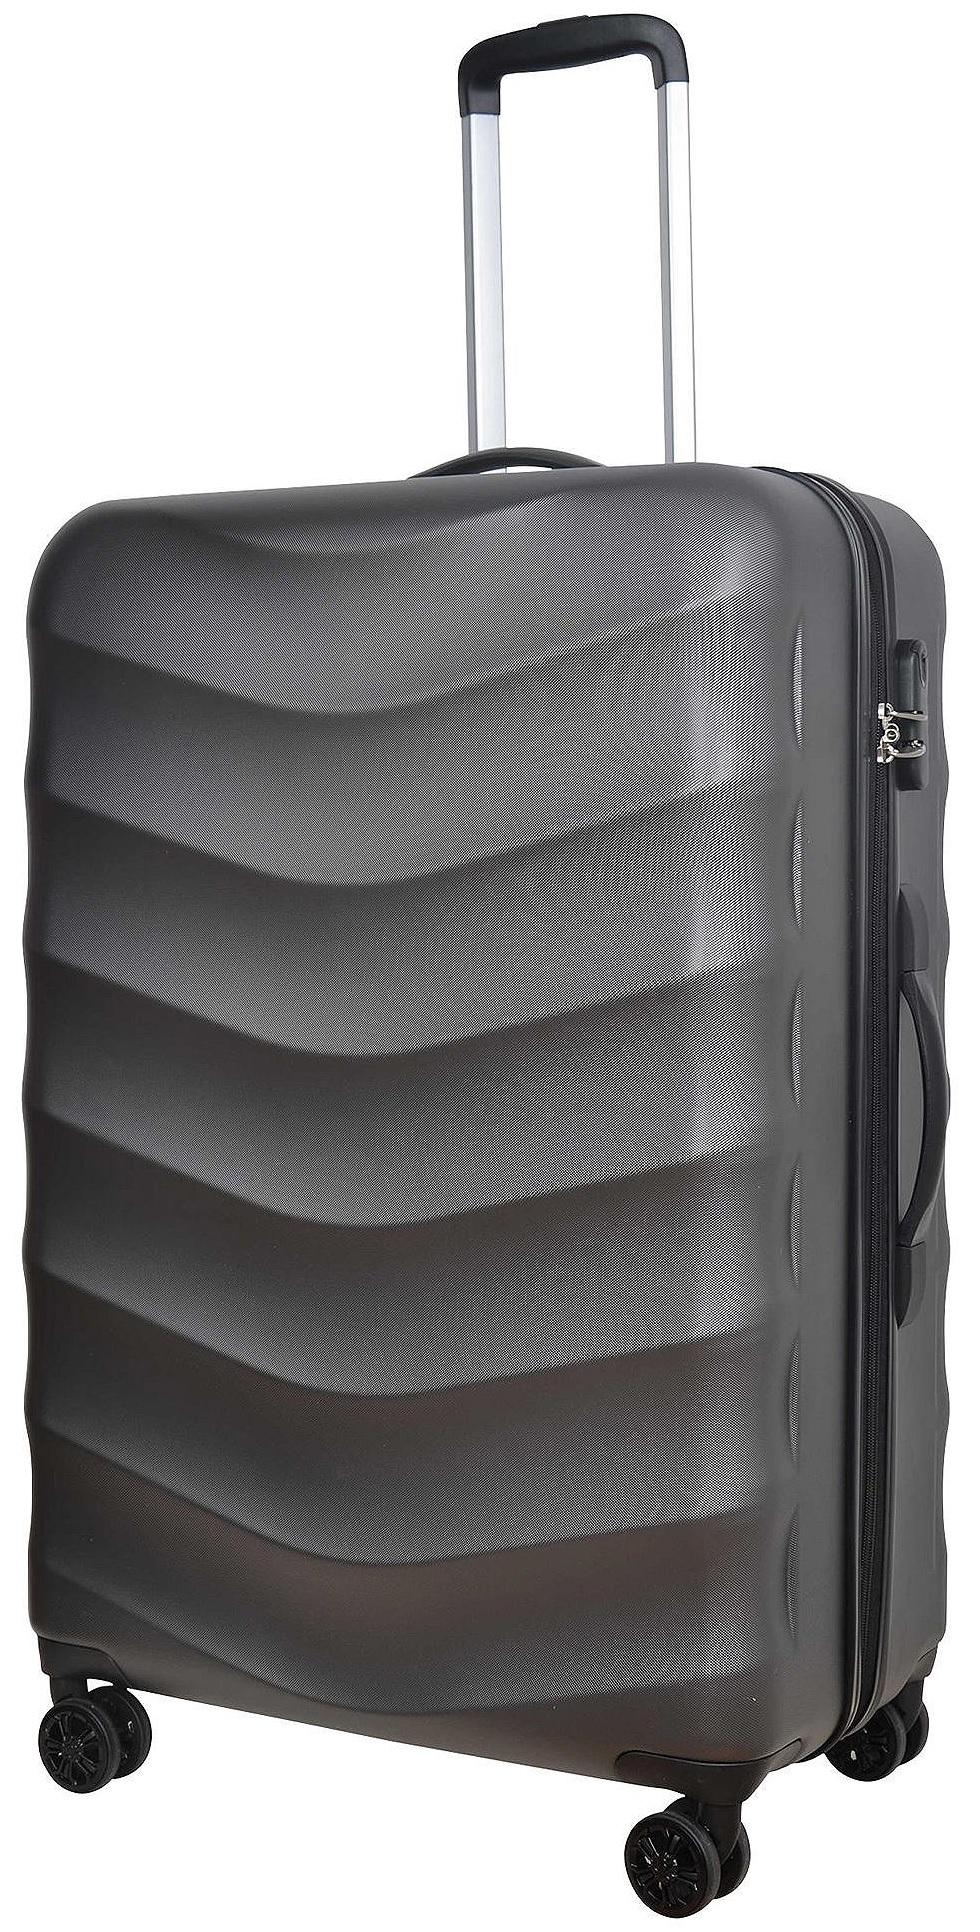 tesco champagne 8 wheel large hard shell 81l suitcase. Black Bedroom Furniture Sets. Home Design Ideas